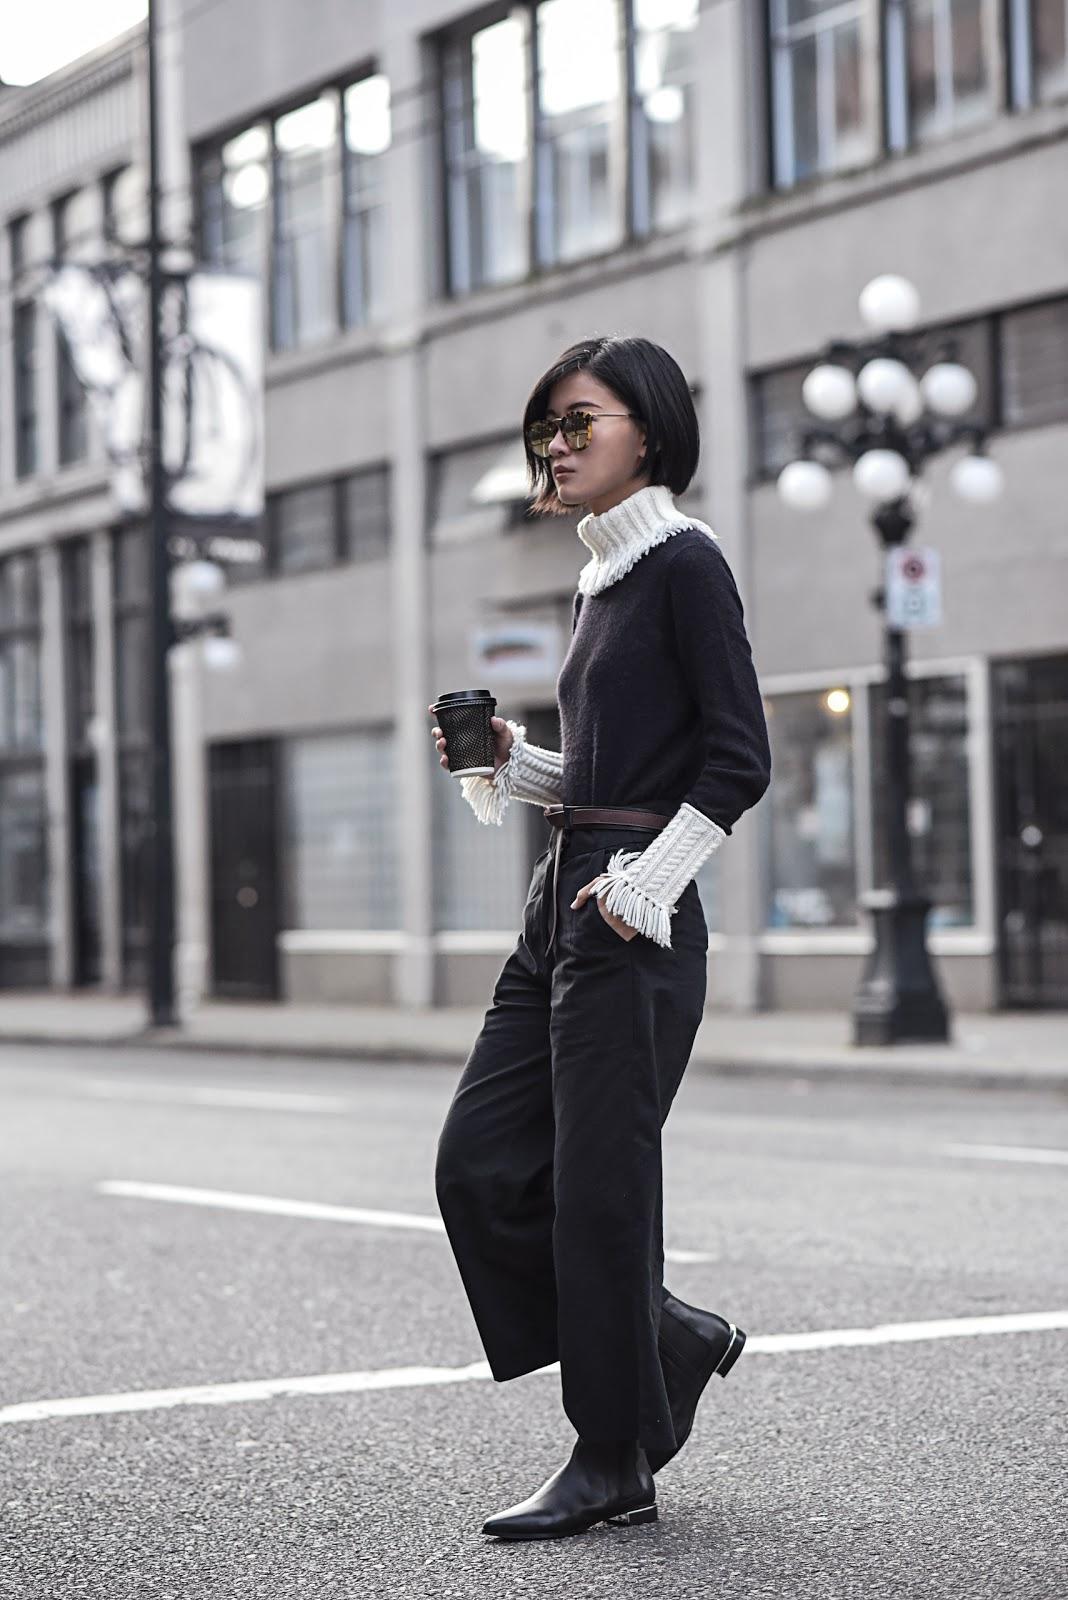 claire liu von vogue tory burch sweater kenzo boots karen walker sunglasses